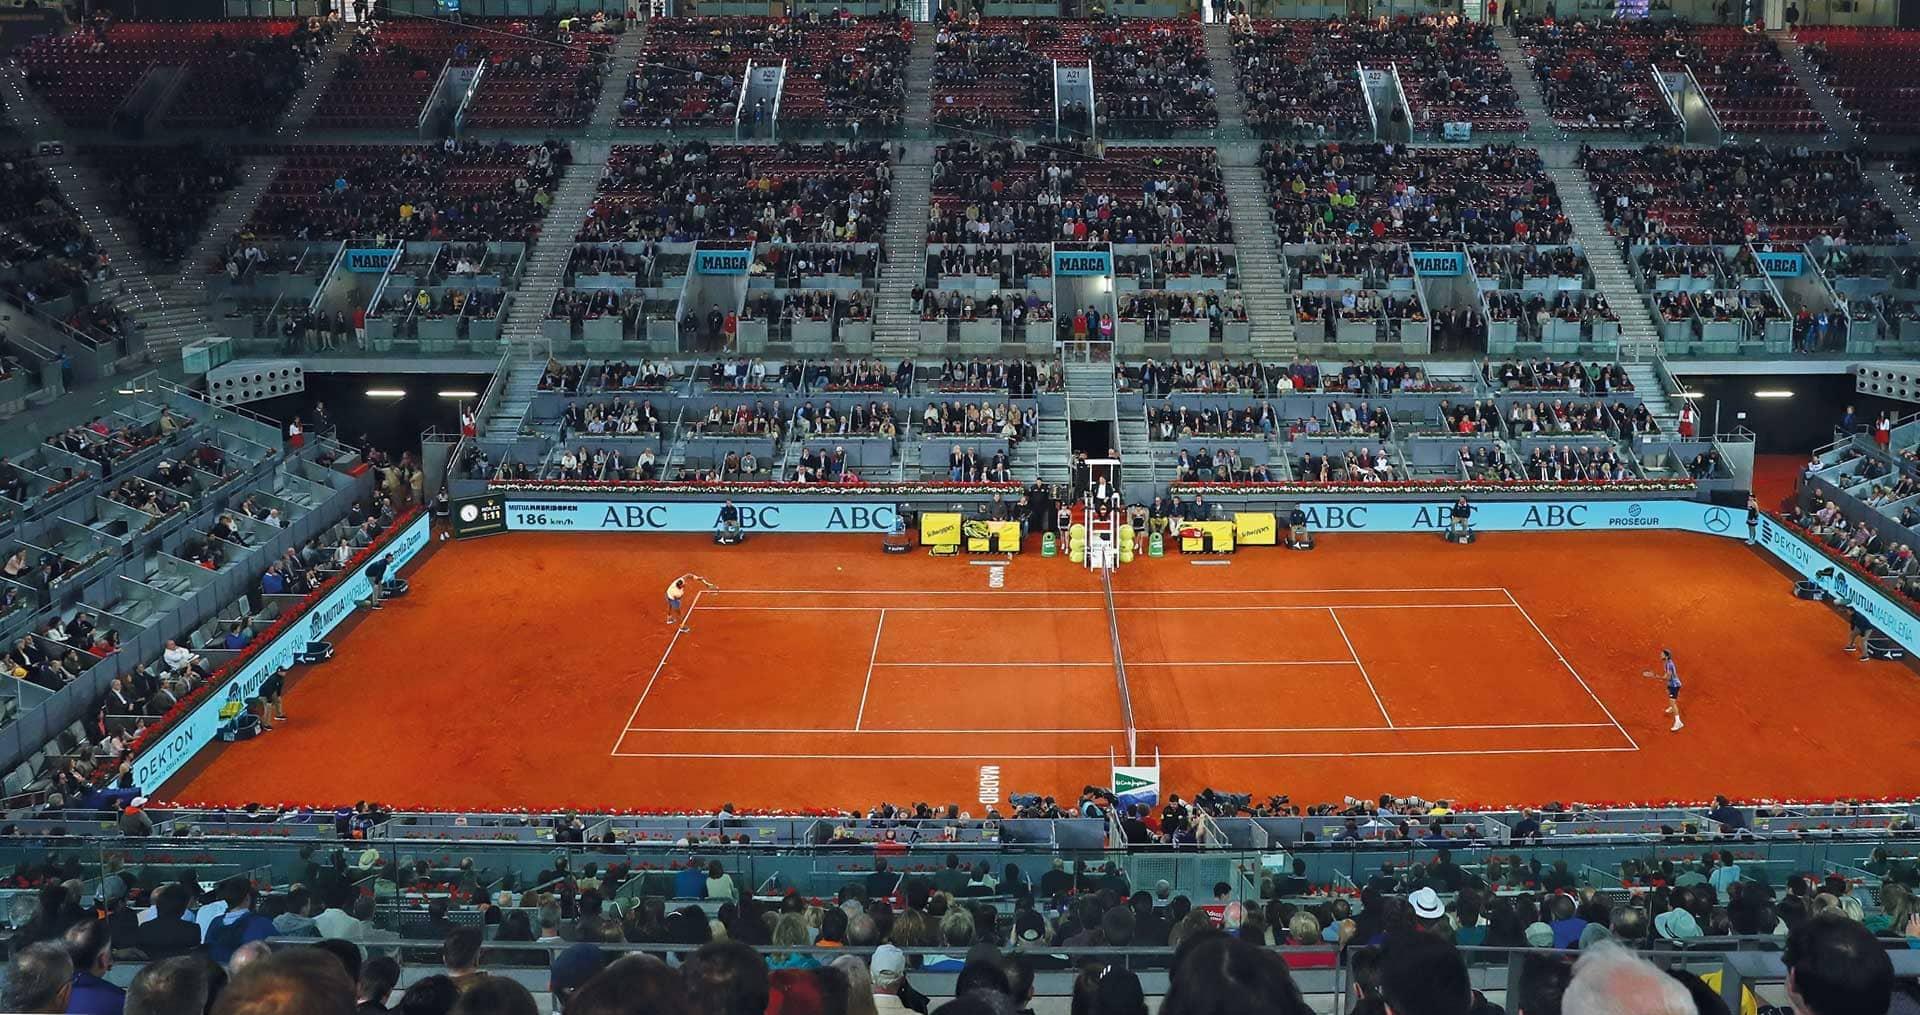 Atp Masters 1000 Madrid Overview Atp Tour Tenis